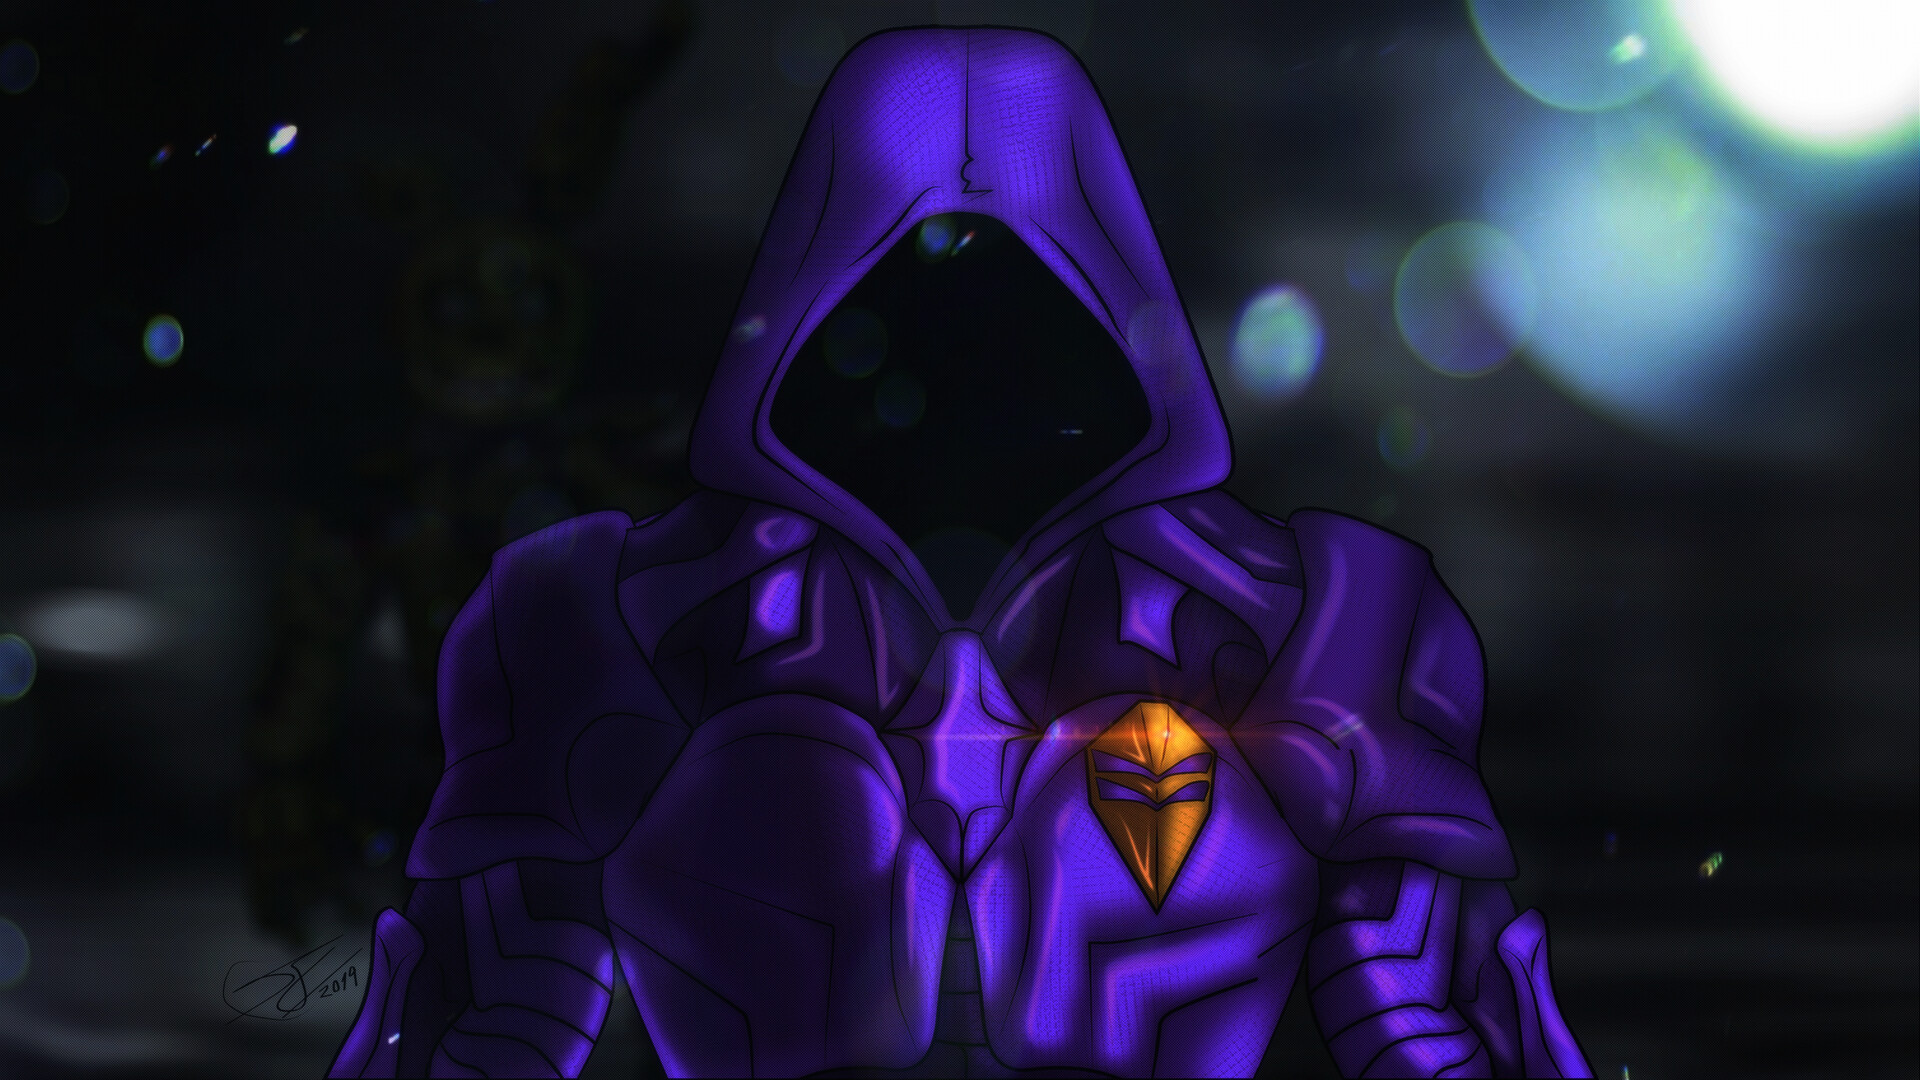 Federico Segovia That Man In Purple